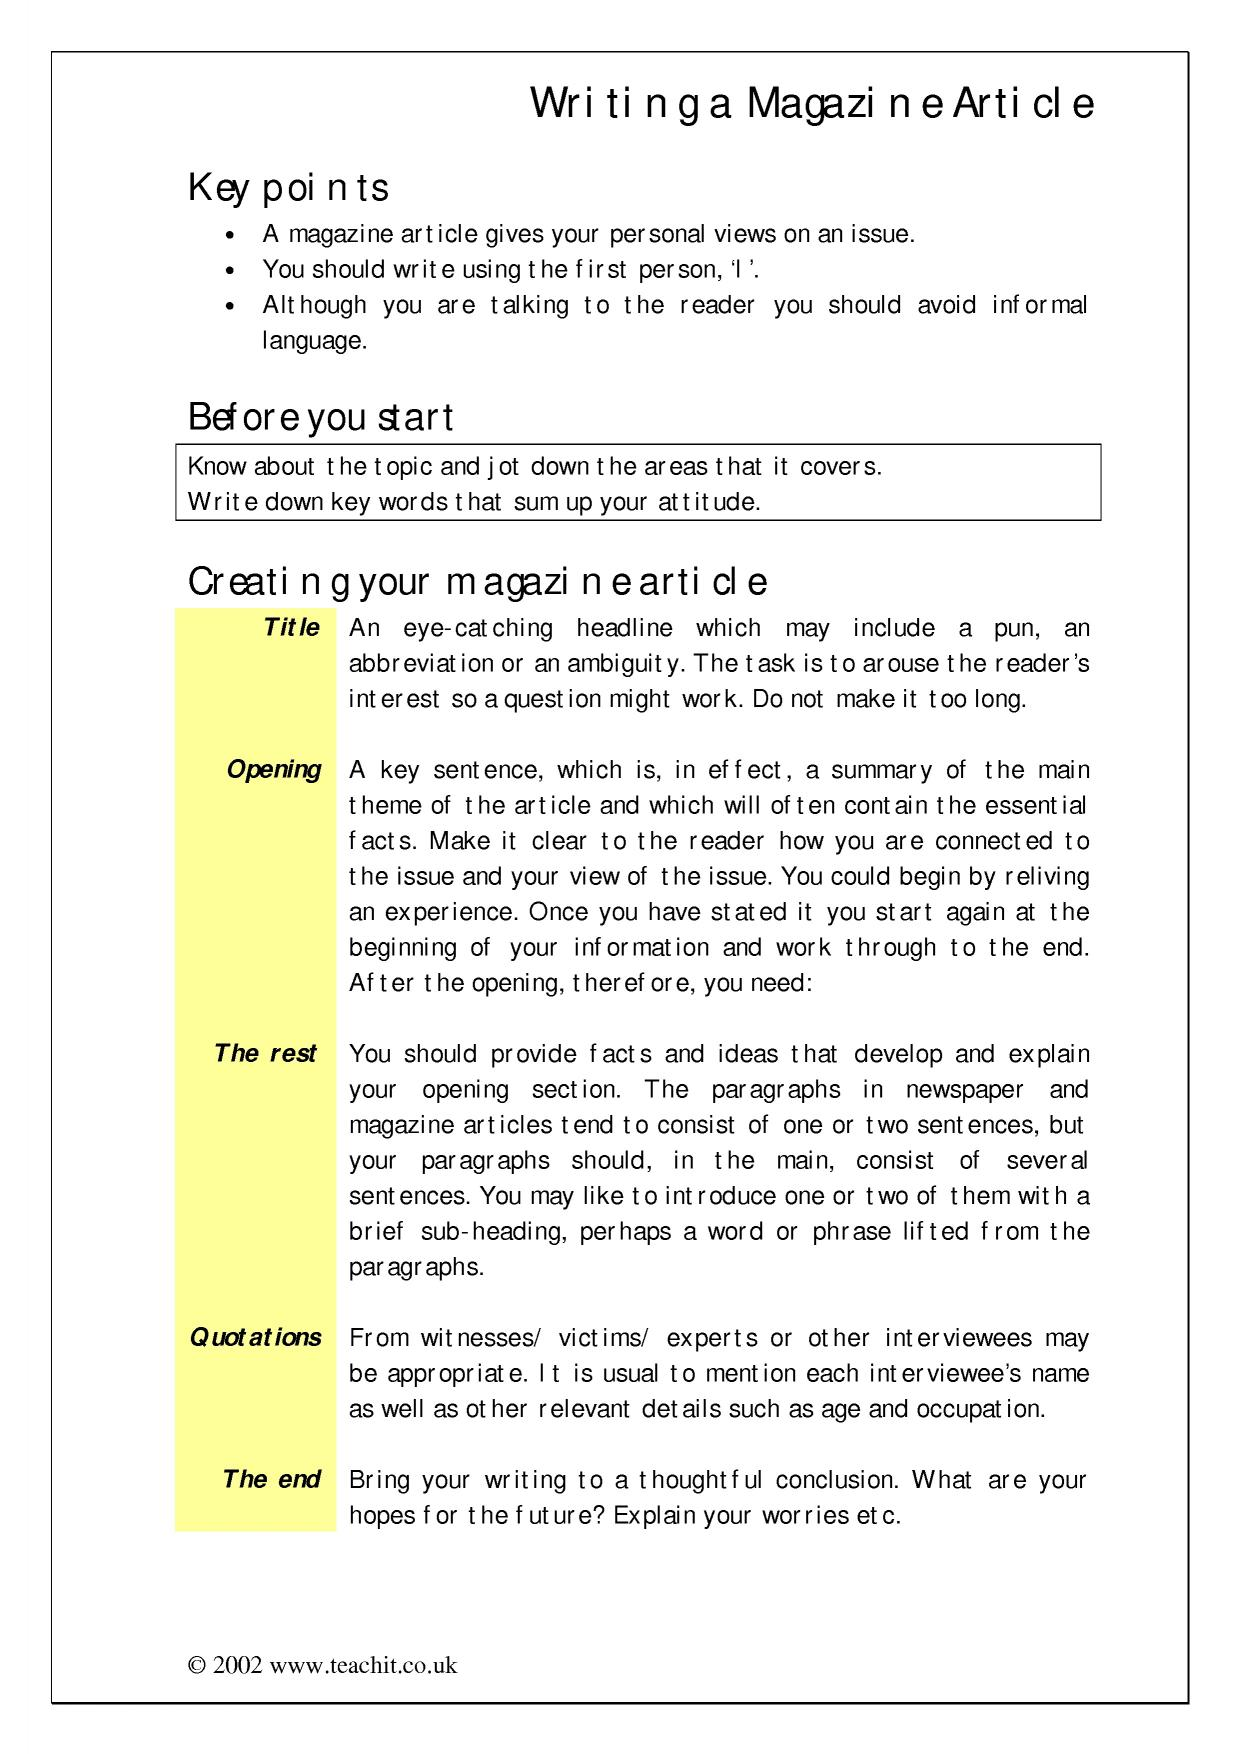 Best Essay Writing Services In Uk Maendeneshjem Dk Auto Electrical Mazda Understanding Wiring Diagram Worksheet Pdfsrcom Homework Help For Kids